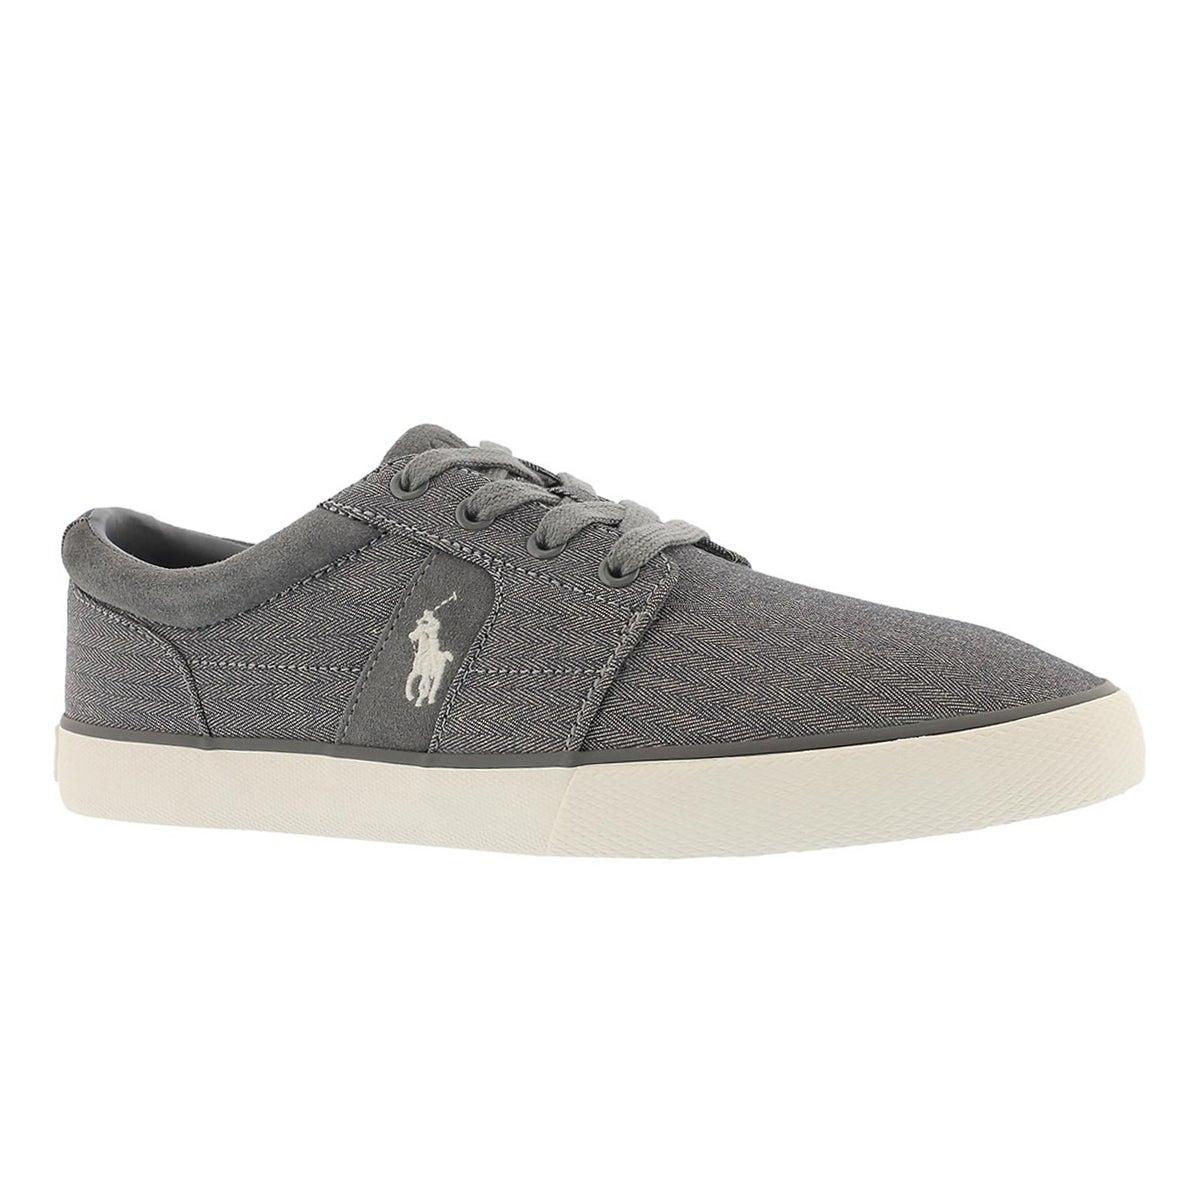 Men's HALMORE II grey lace up sneakers